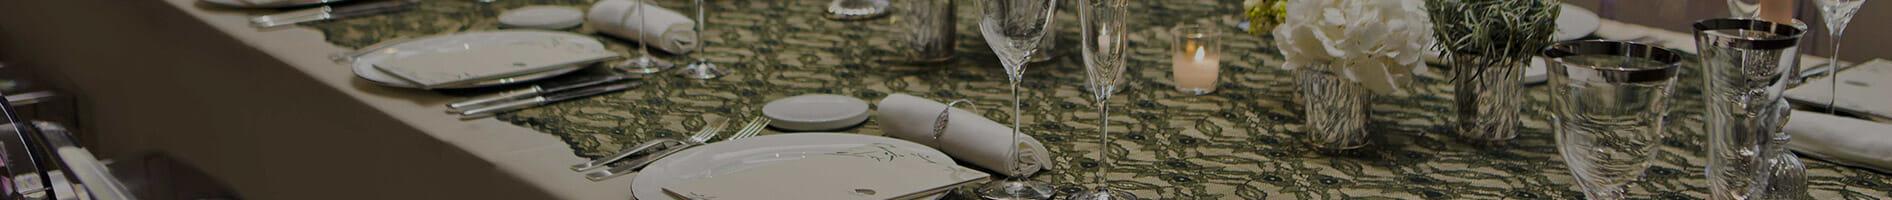 Fashion & Luxury Dinners